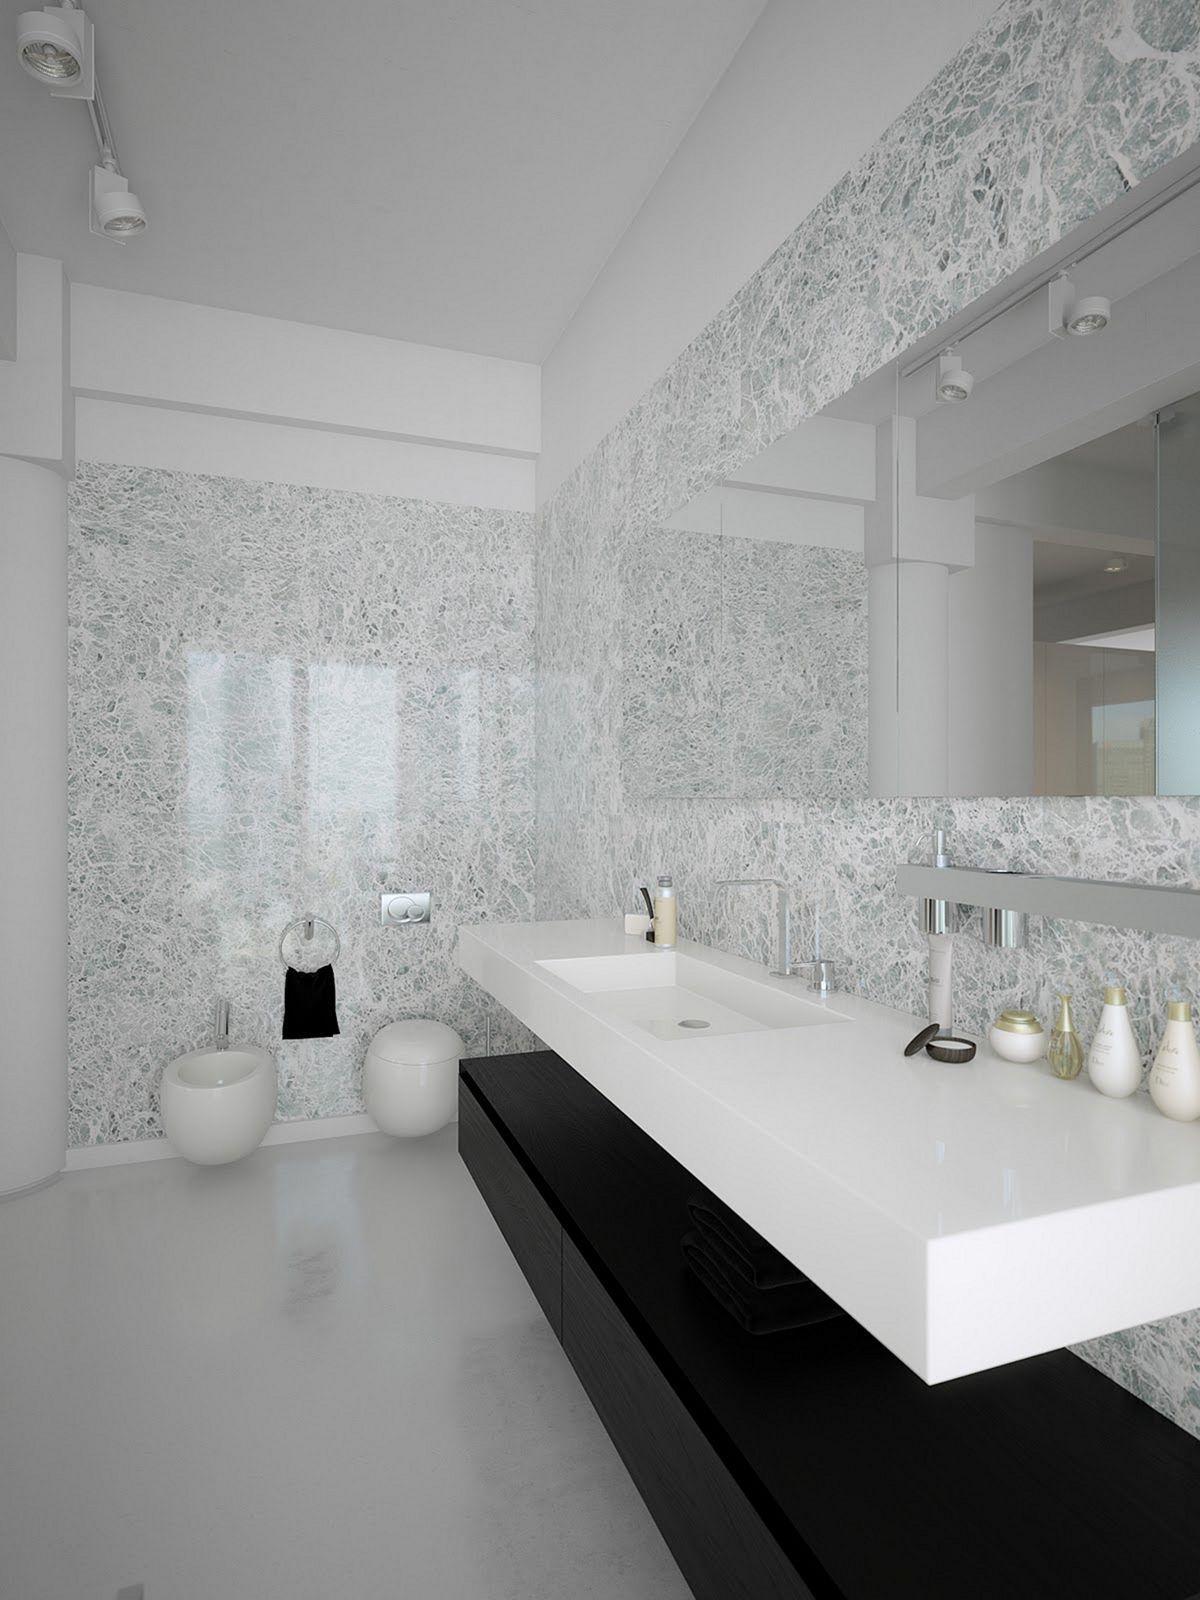 65 Best Black Bathrooms Interior Ideas For Cool Bathroom Design Freshouz Com Minimalist Bathroom Design Contemporary Bathroom Designs Stylish Bathroom